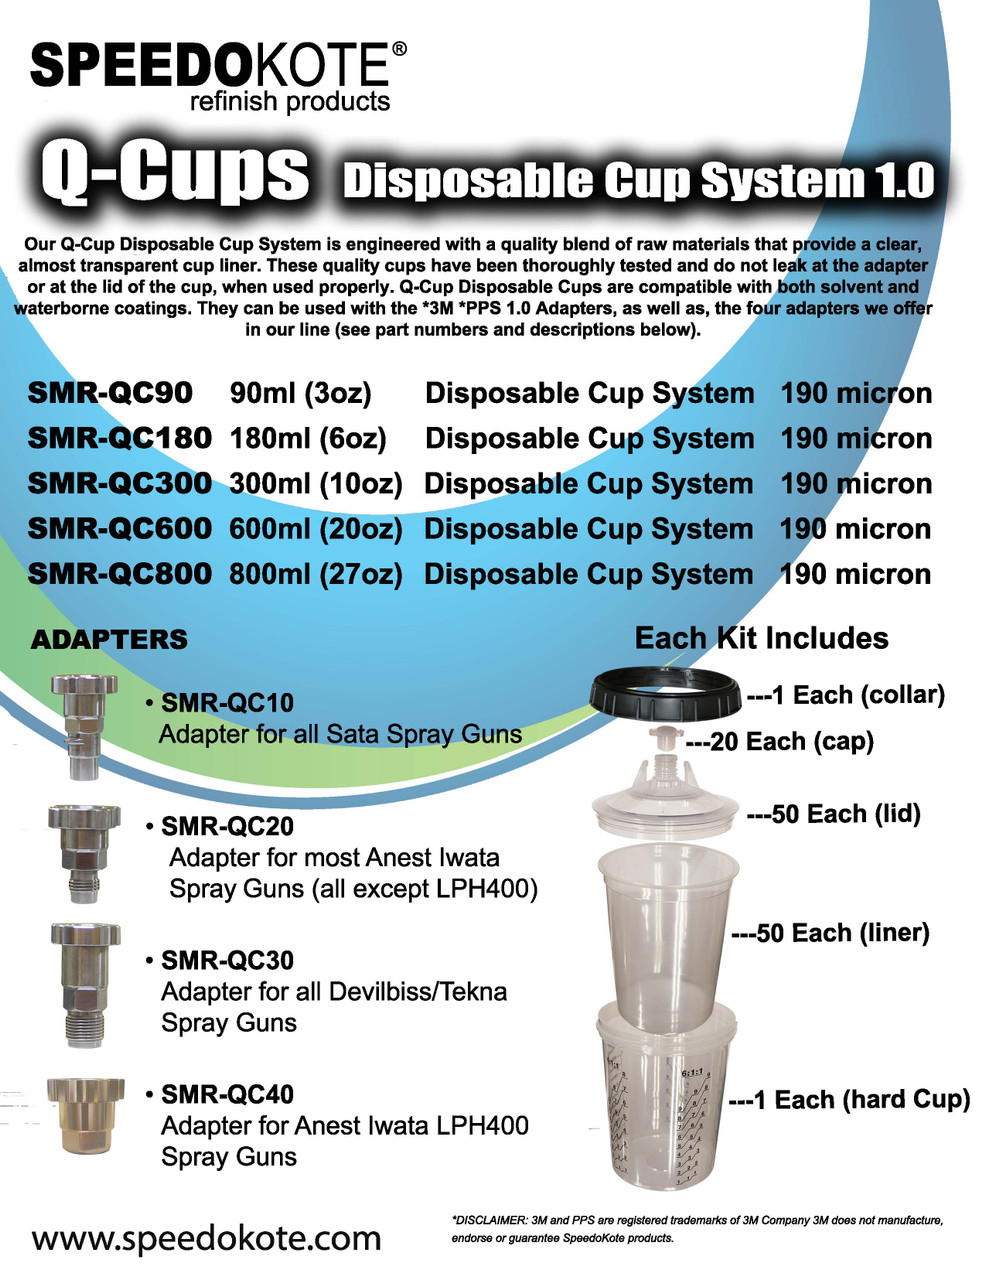 Q-Cup Spray Gun Cup Adapter SMR-QC10 - Fits Full Size SATA Gravity Spray Guns